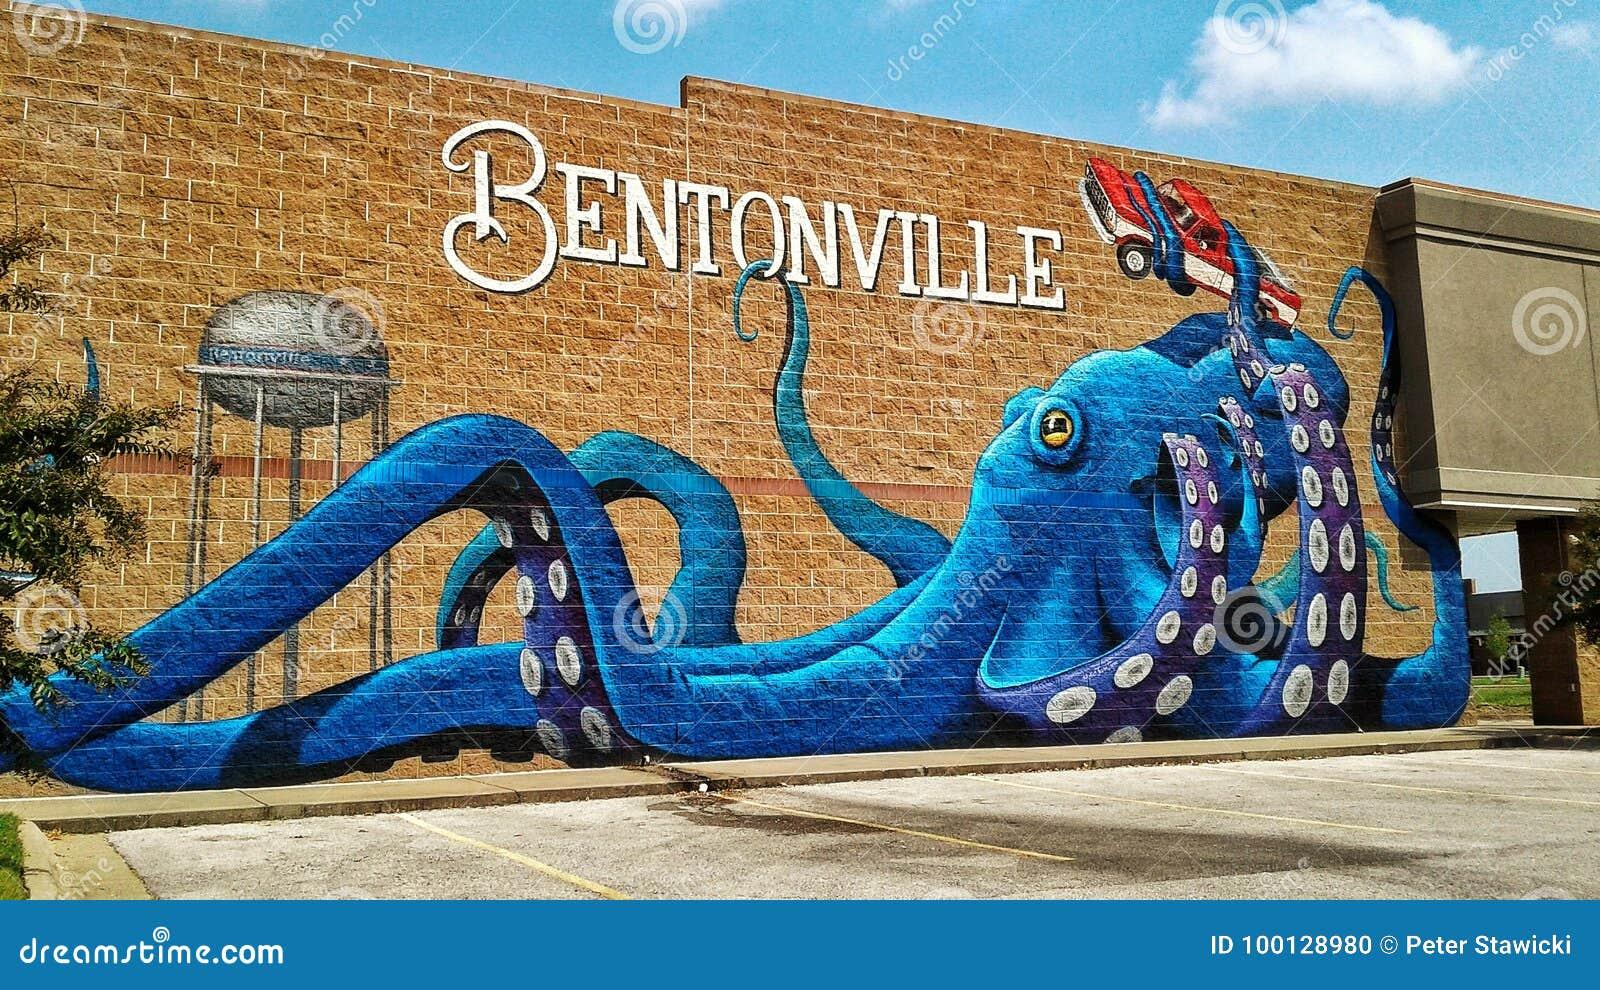 Bentonville Arkansas mural